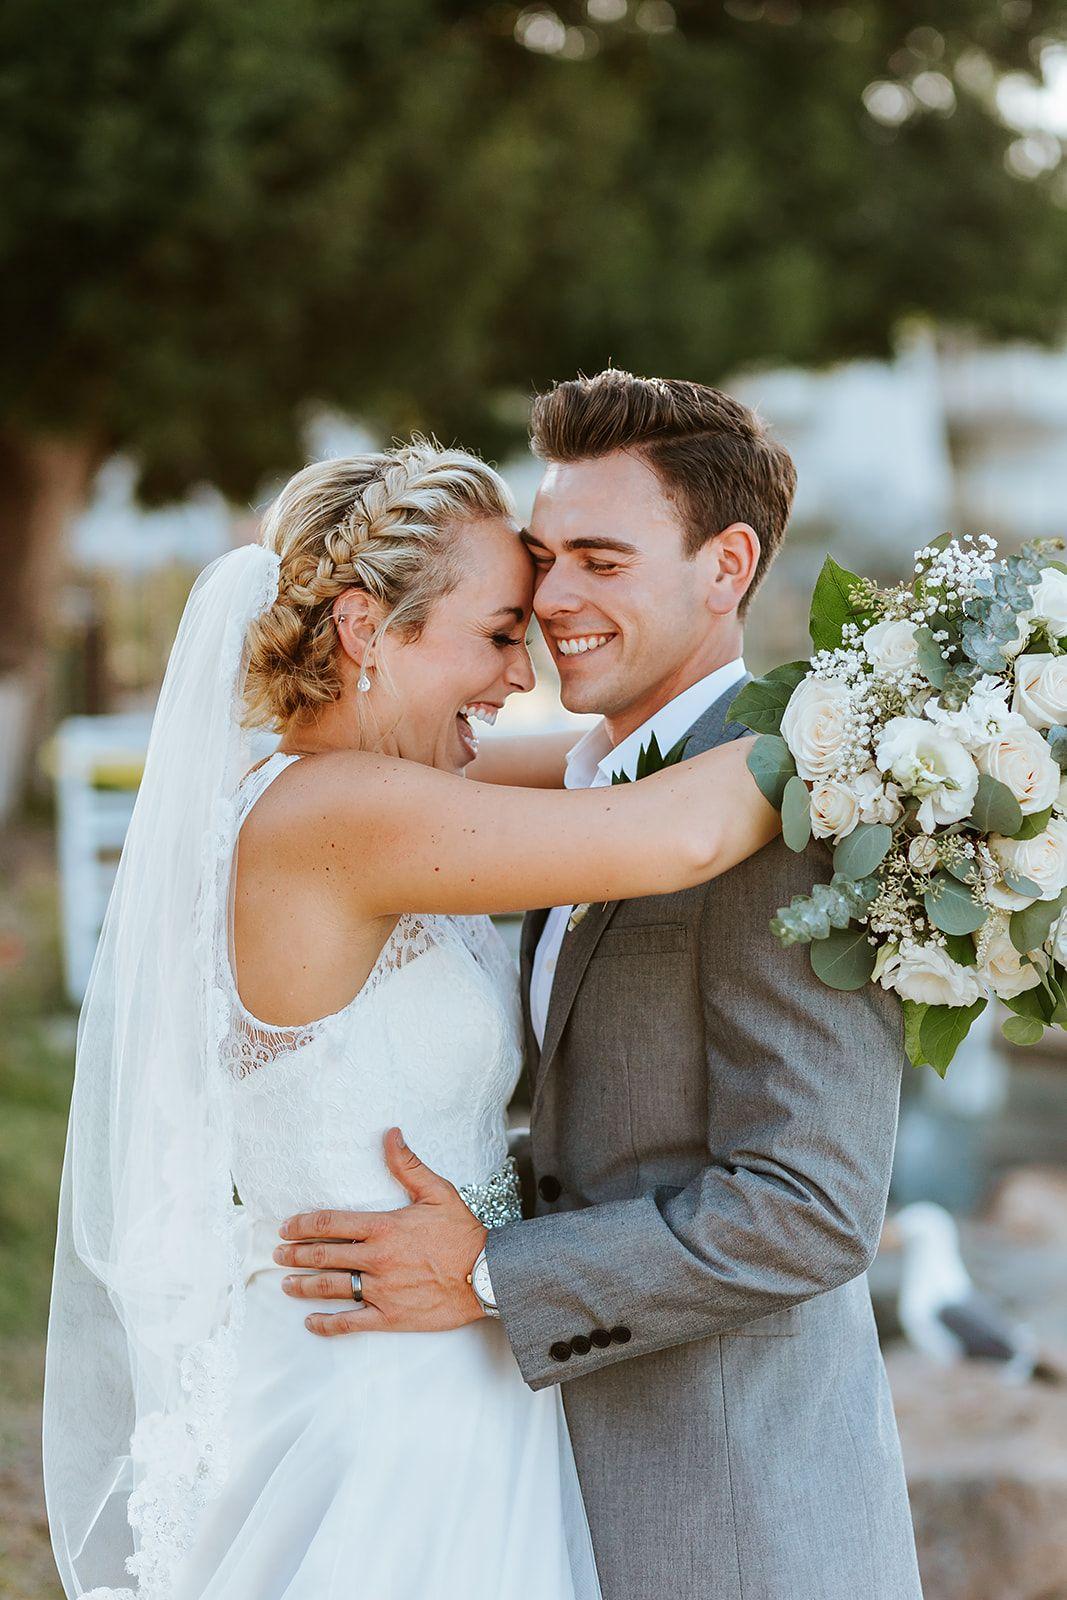 Southern California Wedding Photography Orange County P Southern California Wedding Photography Orange County Wedding Photographer Wedding Southern California